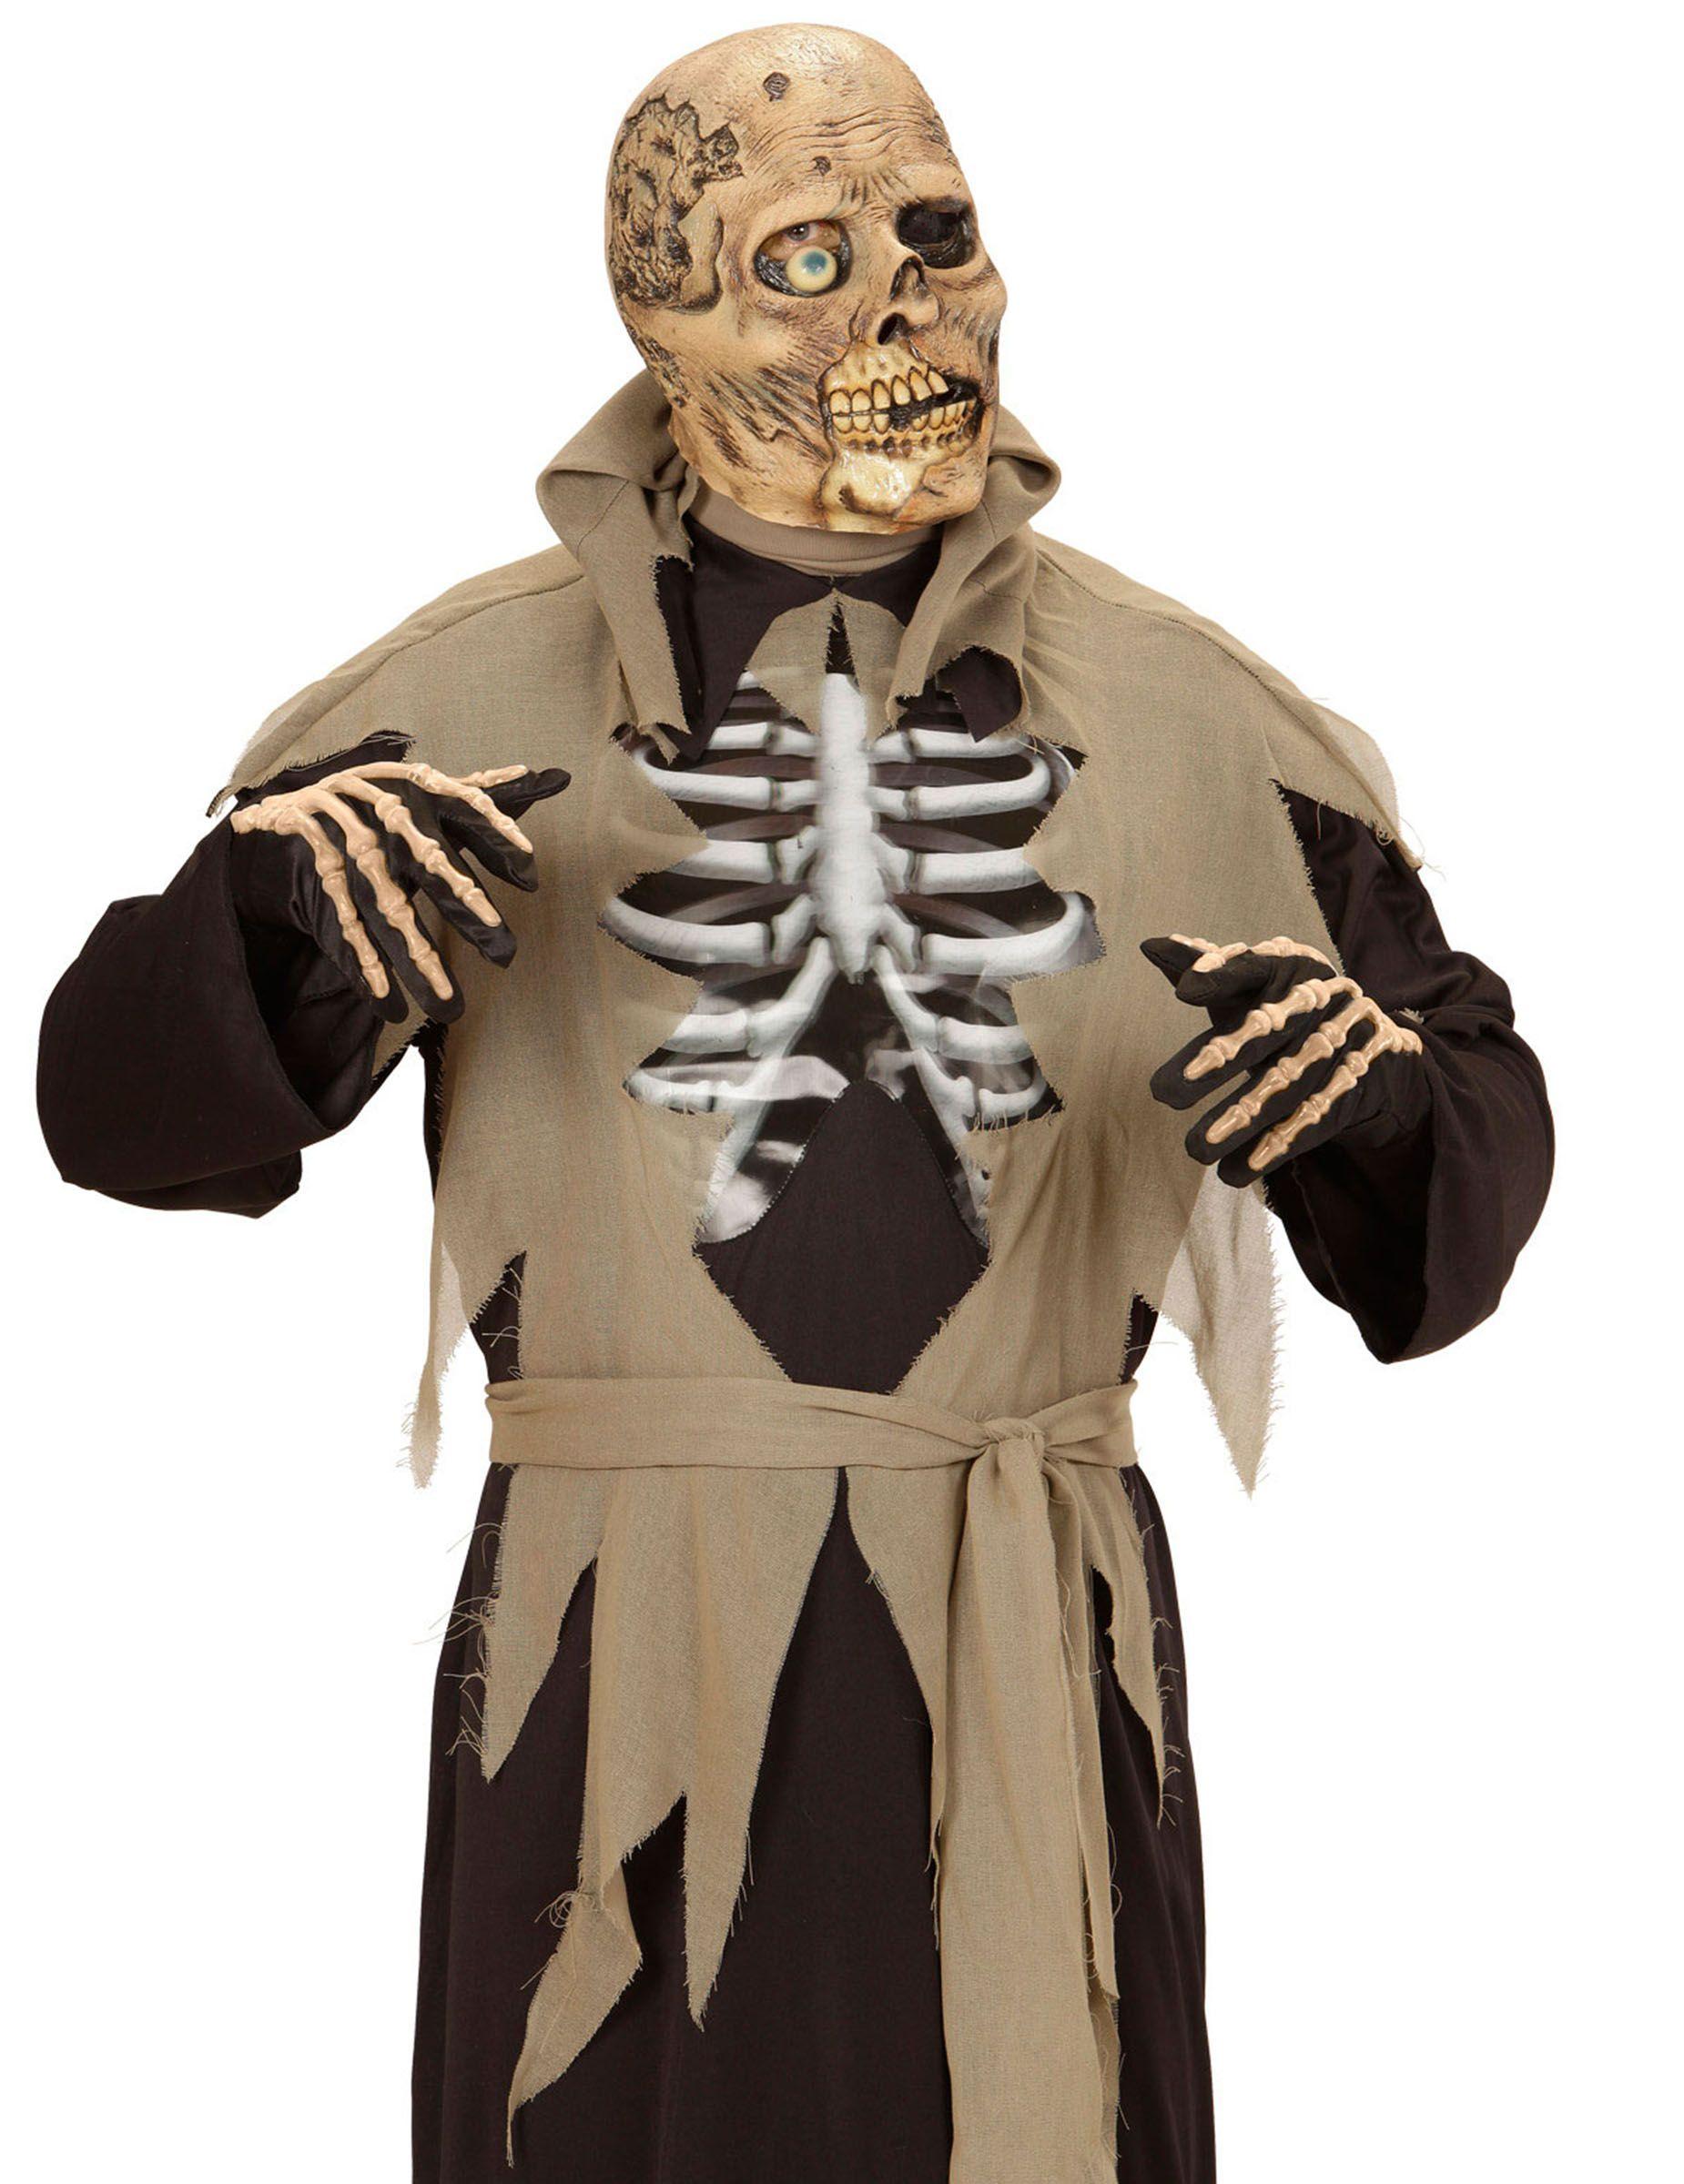 Halloween Maschere.Maschera Adulto Zombie Con Un Occhio Solo Halloween Body Art